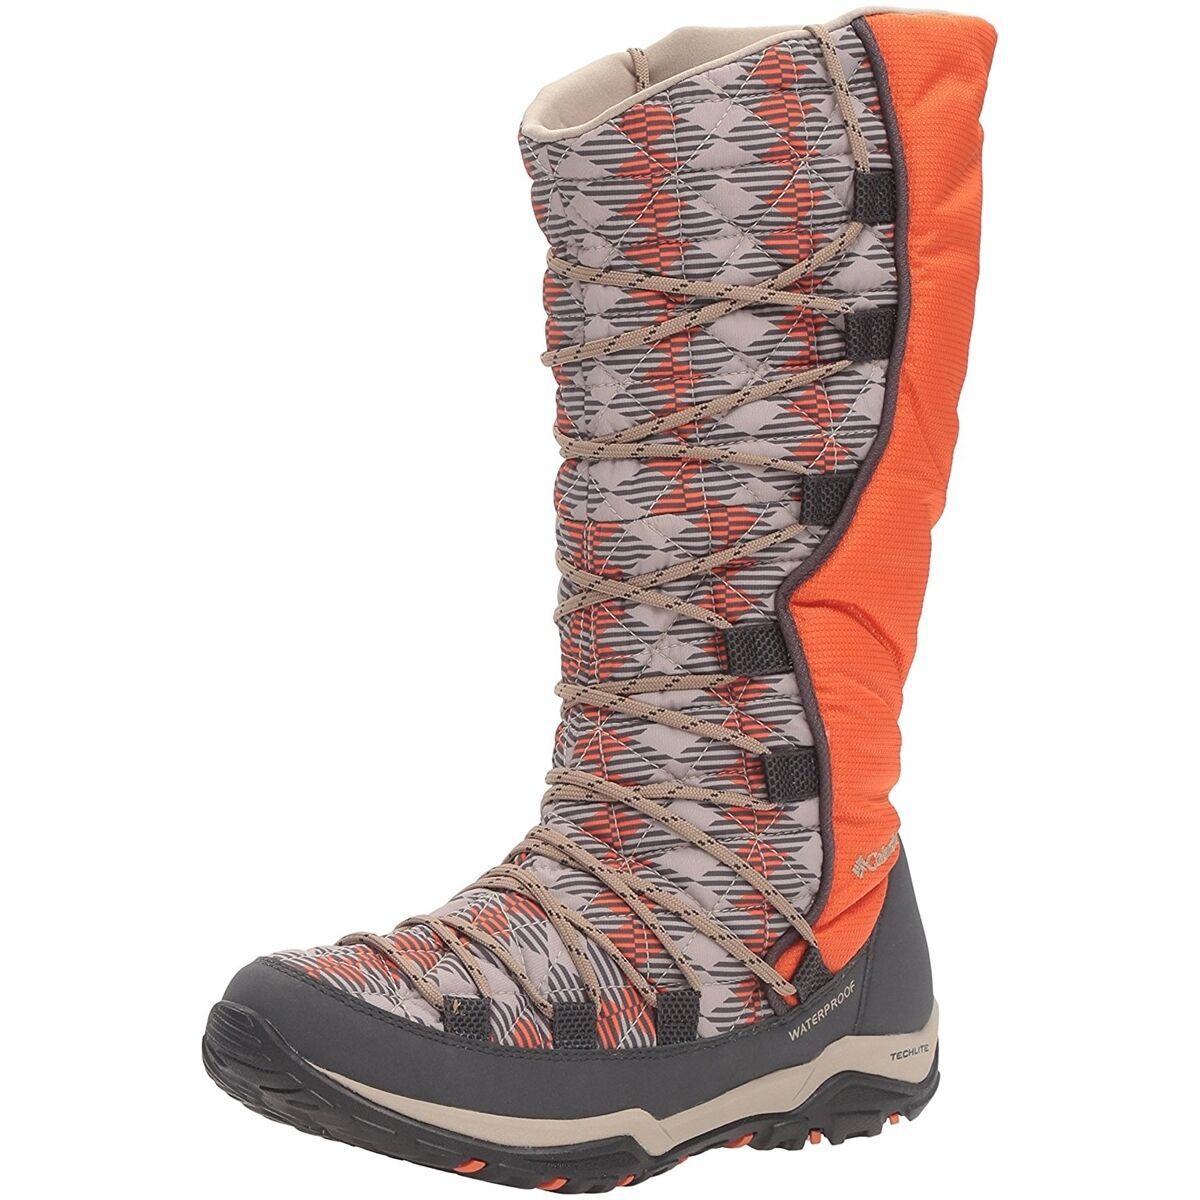 Columbia LOVELAND OMNI-HEAT PRINT BOOT Waterproof Women Winter Boots NEW